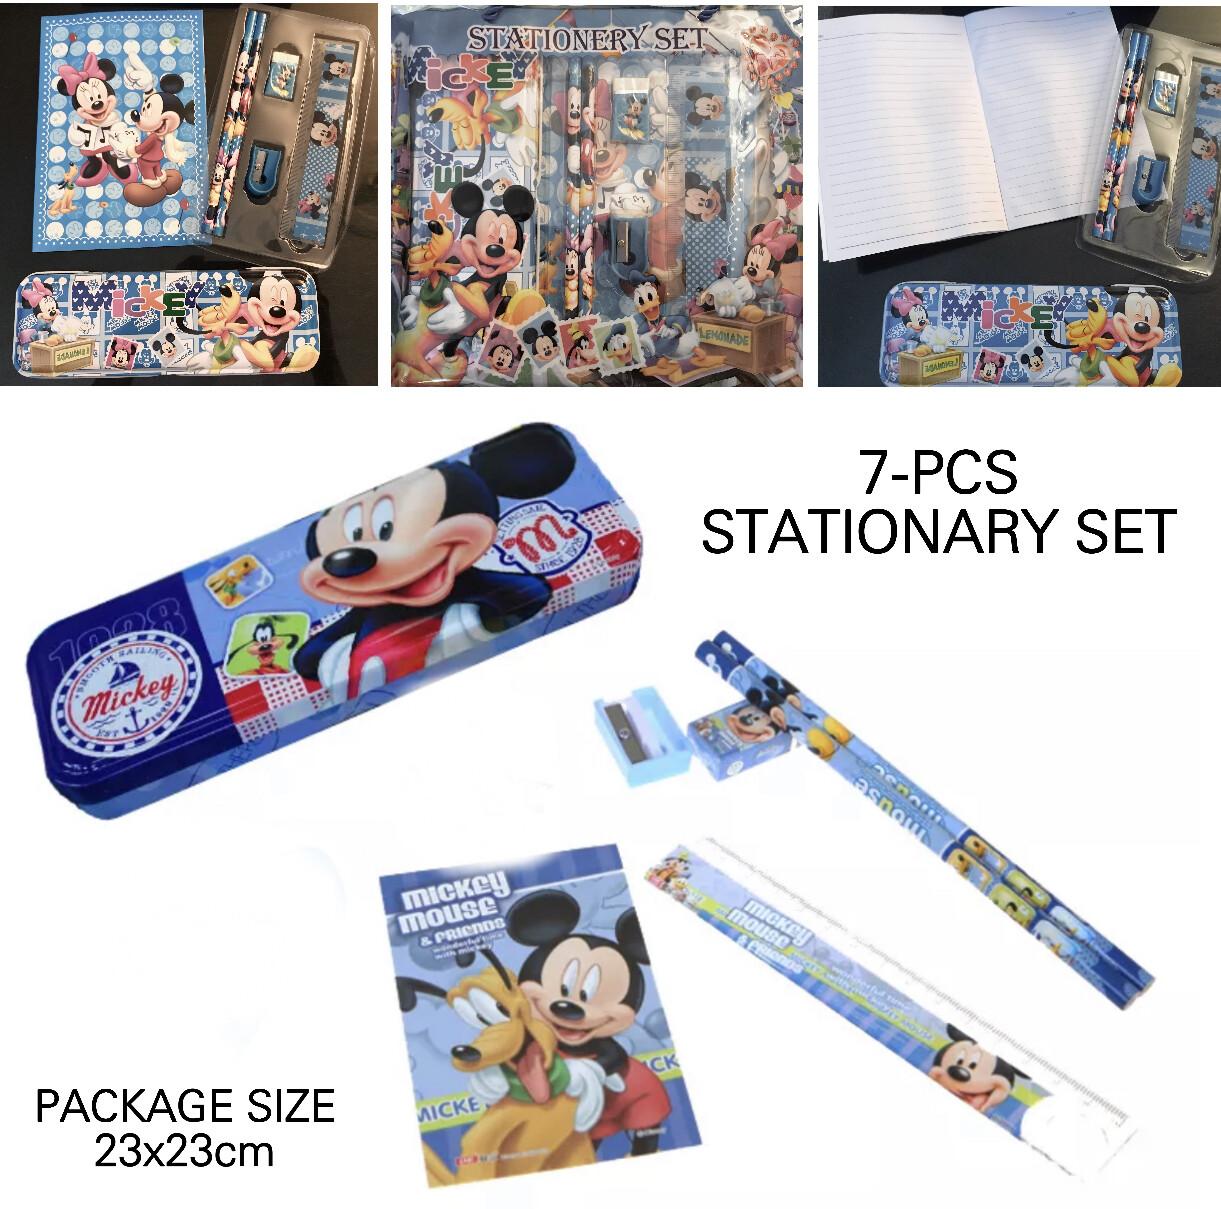 7-Pcs Stationery Set